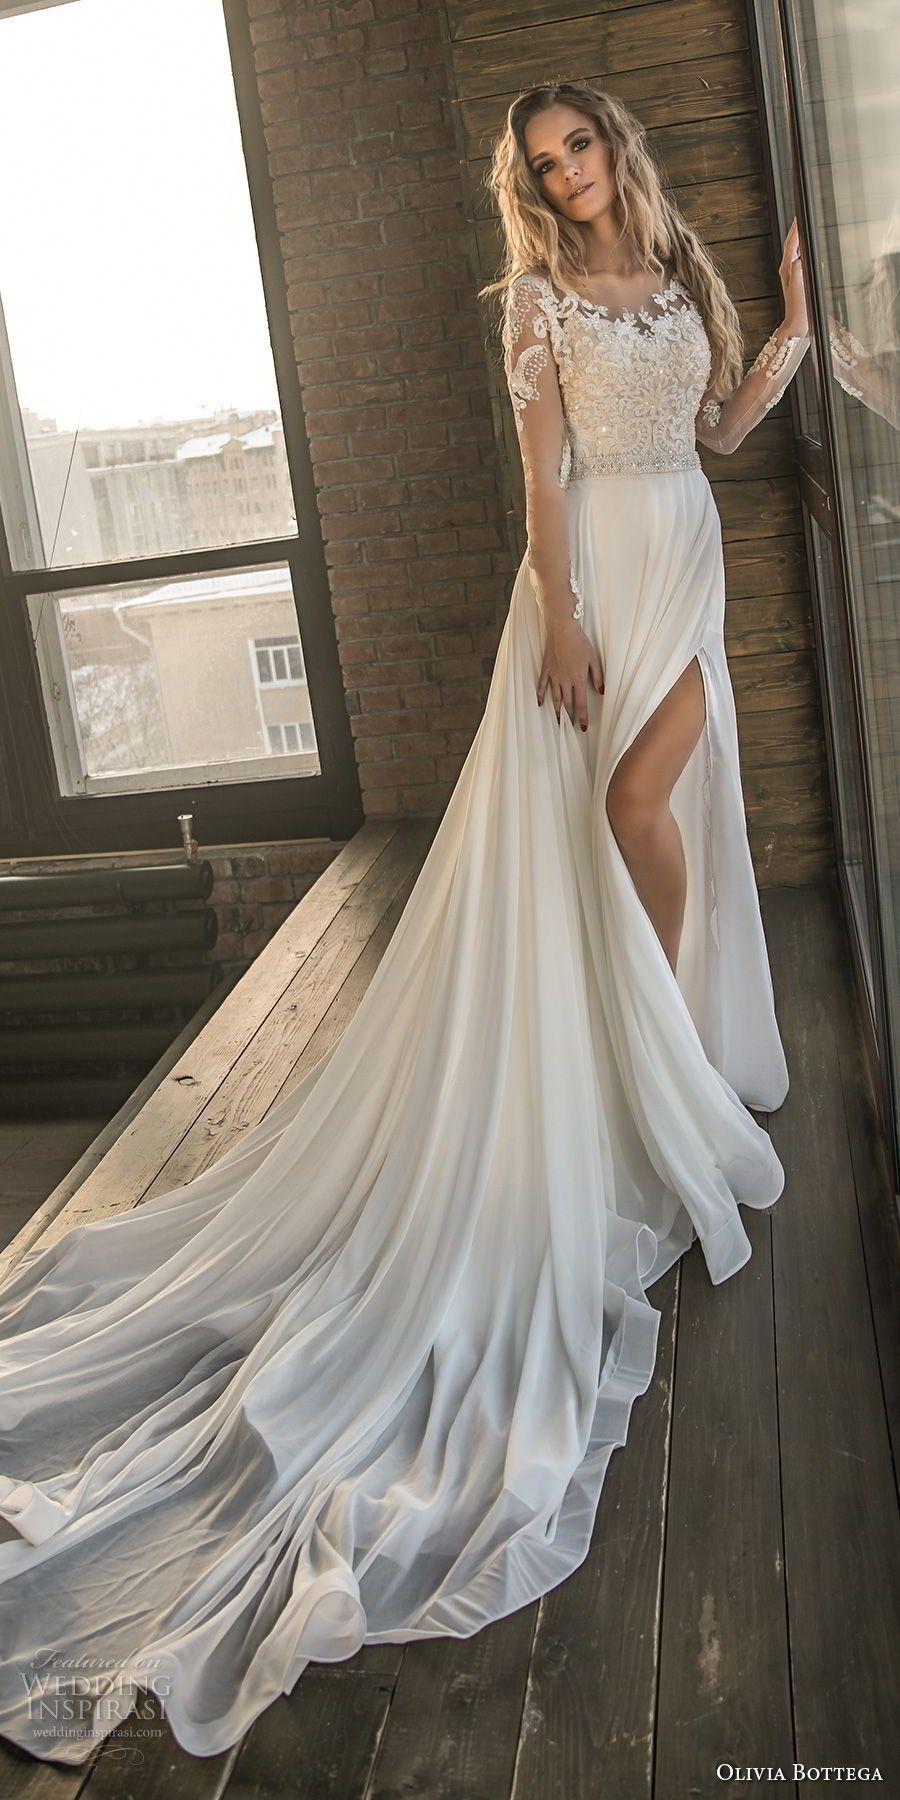 Olivia bottega bridal long sleeves sweetheart neckline heavily